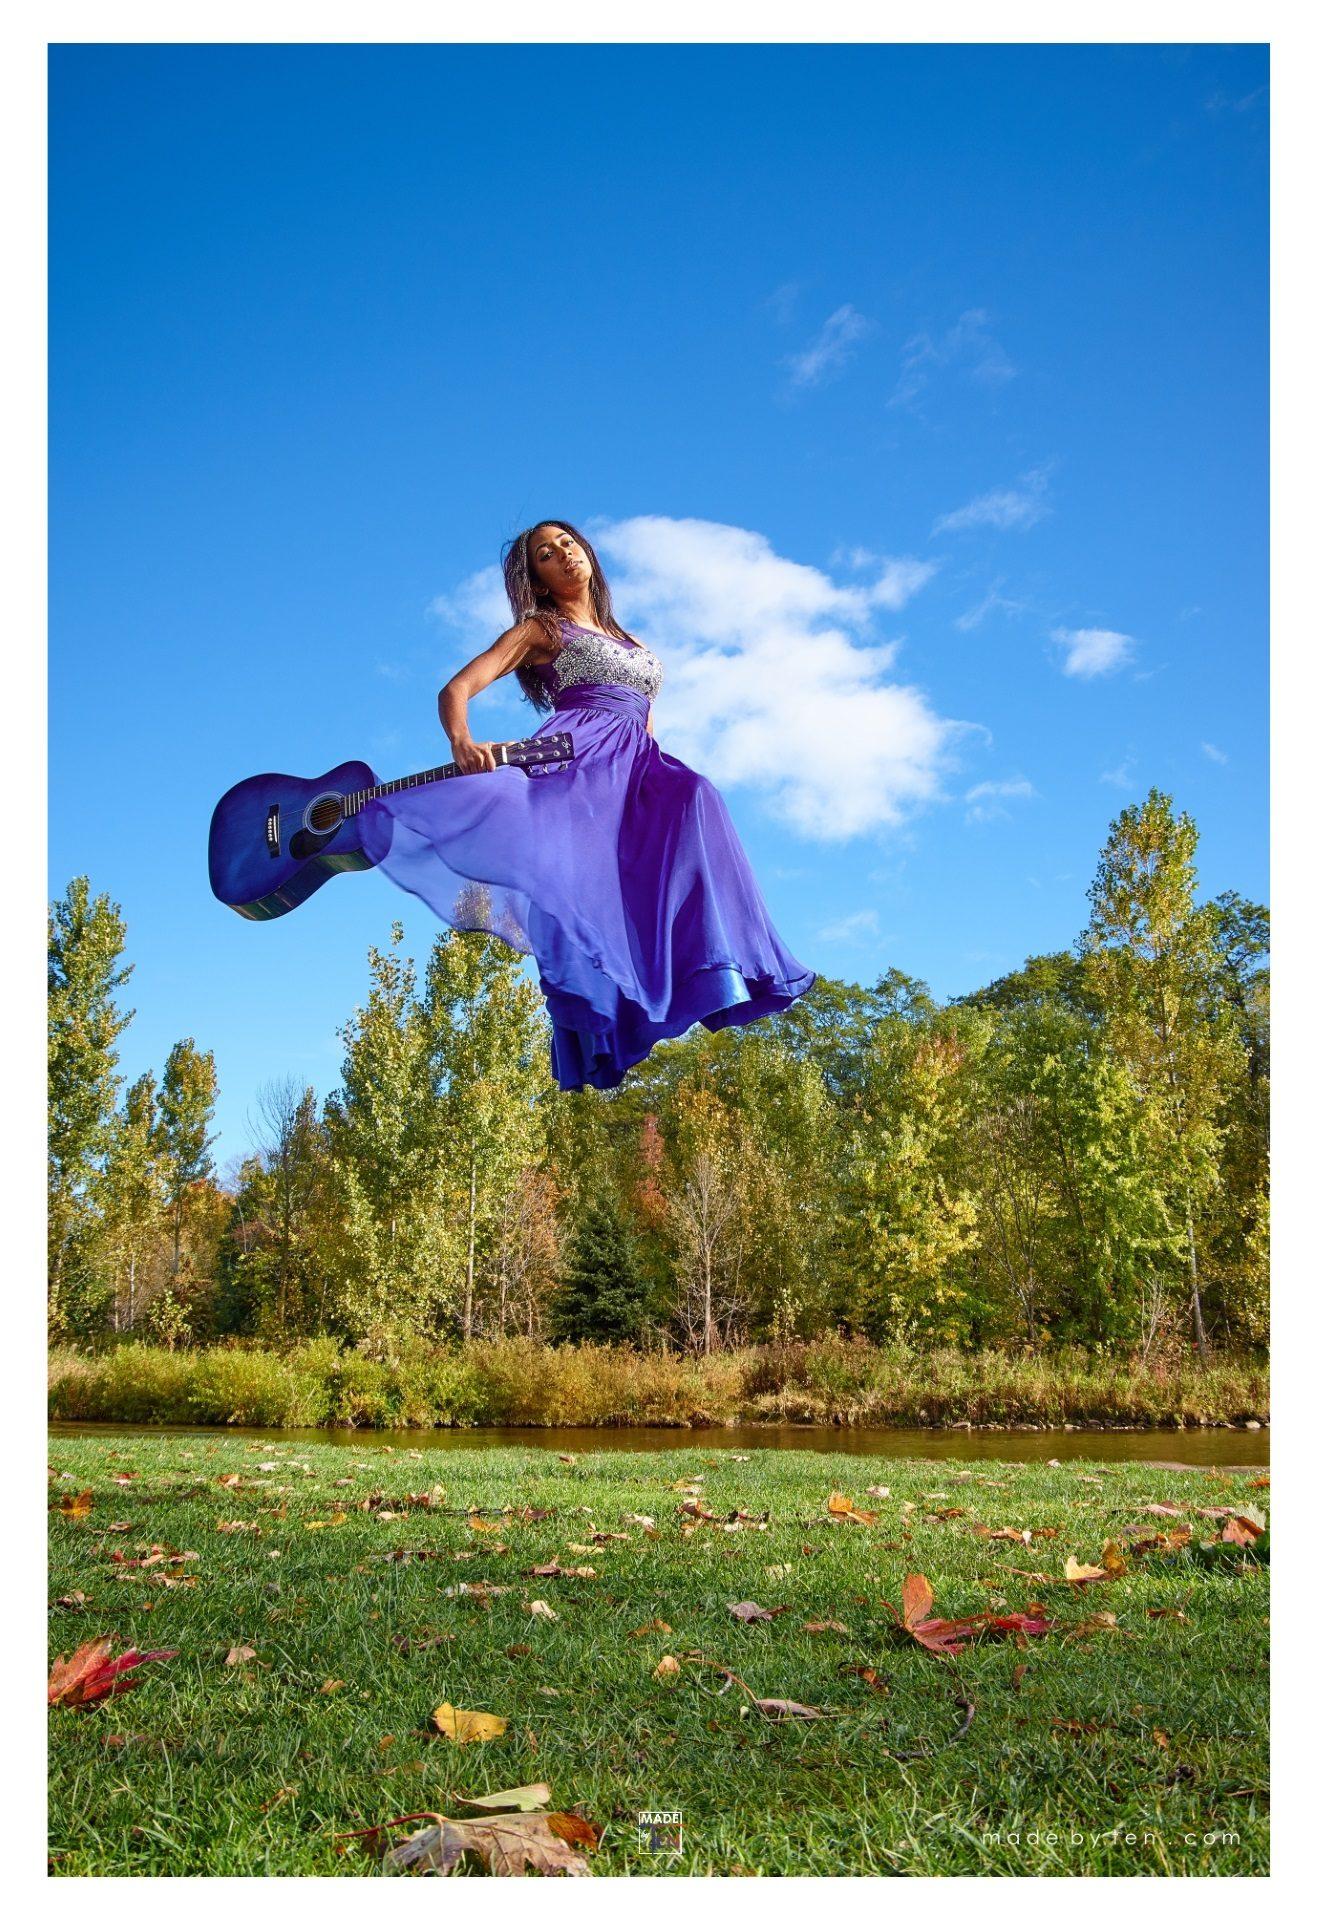 Dress Guitar Floating Levitating Fall - GTA Women Fantasy Photography